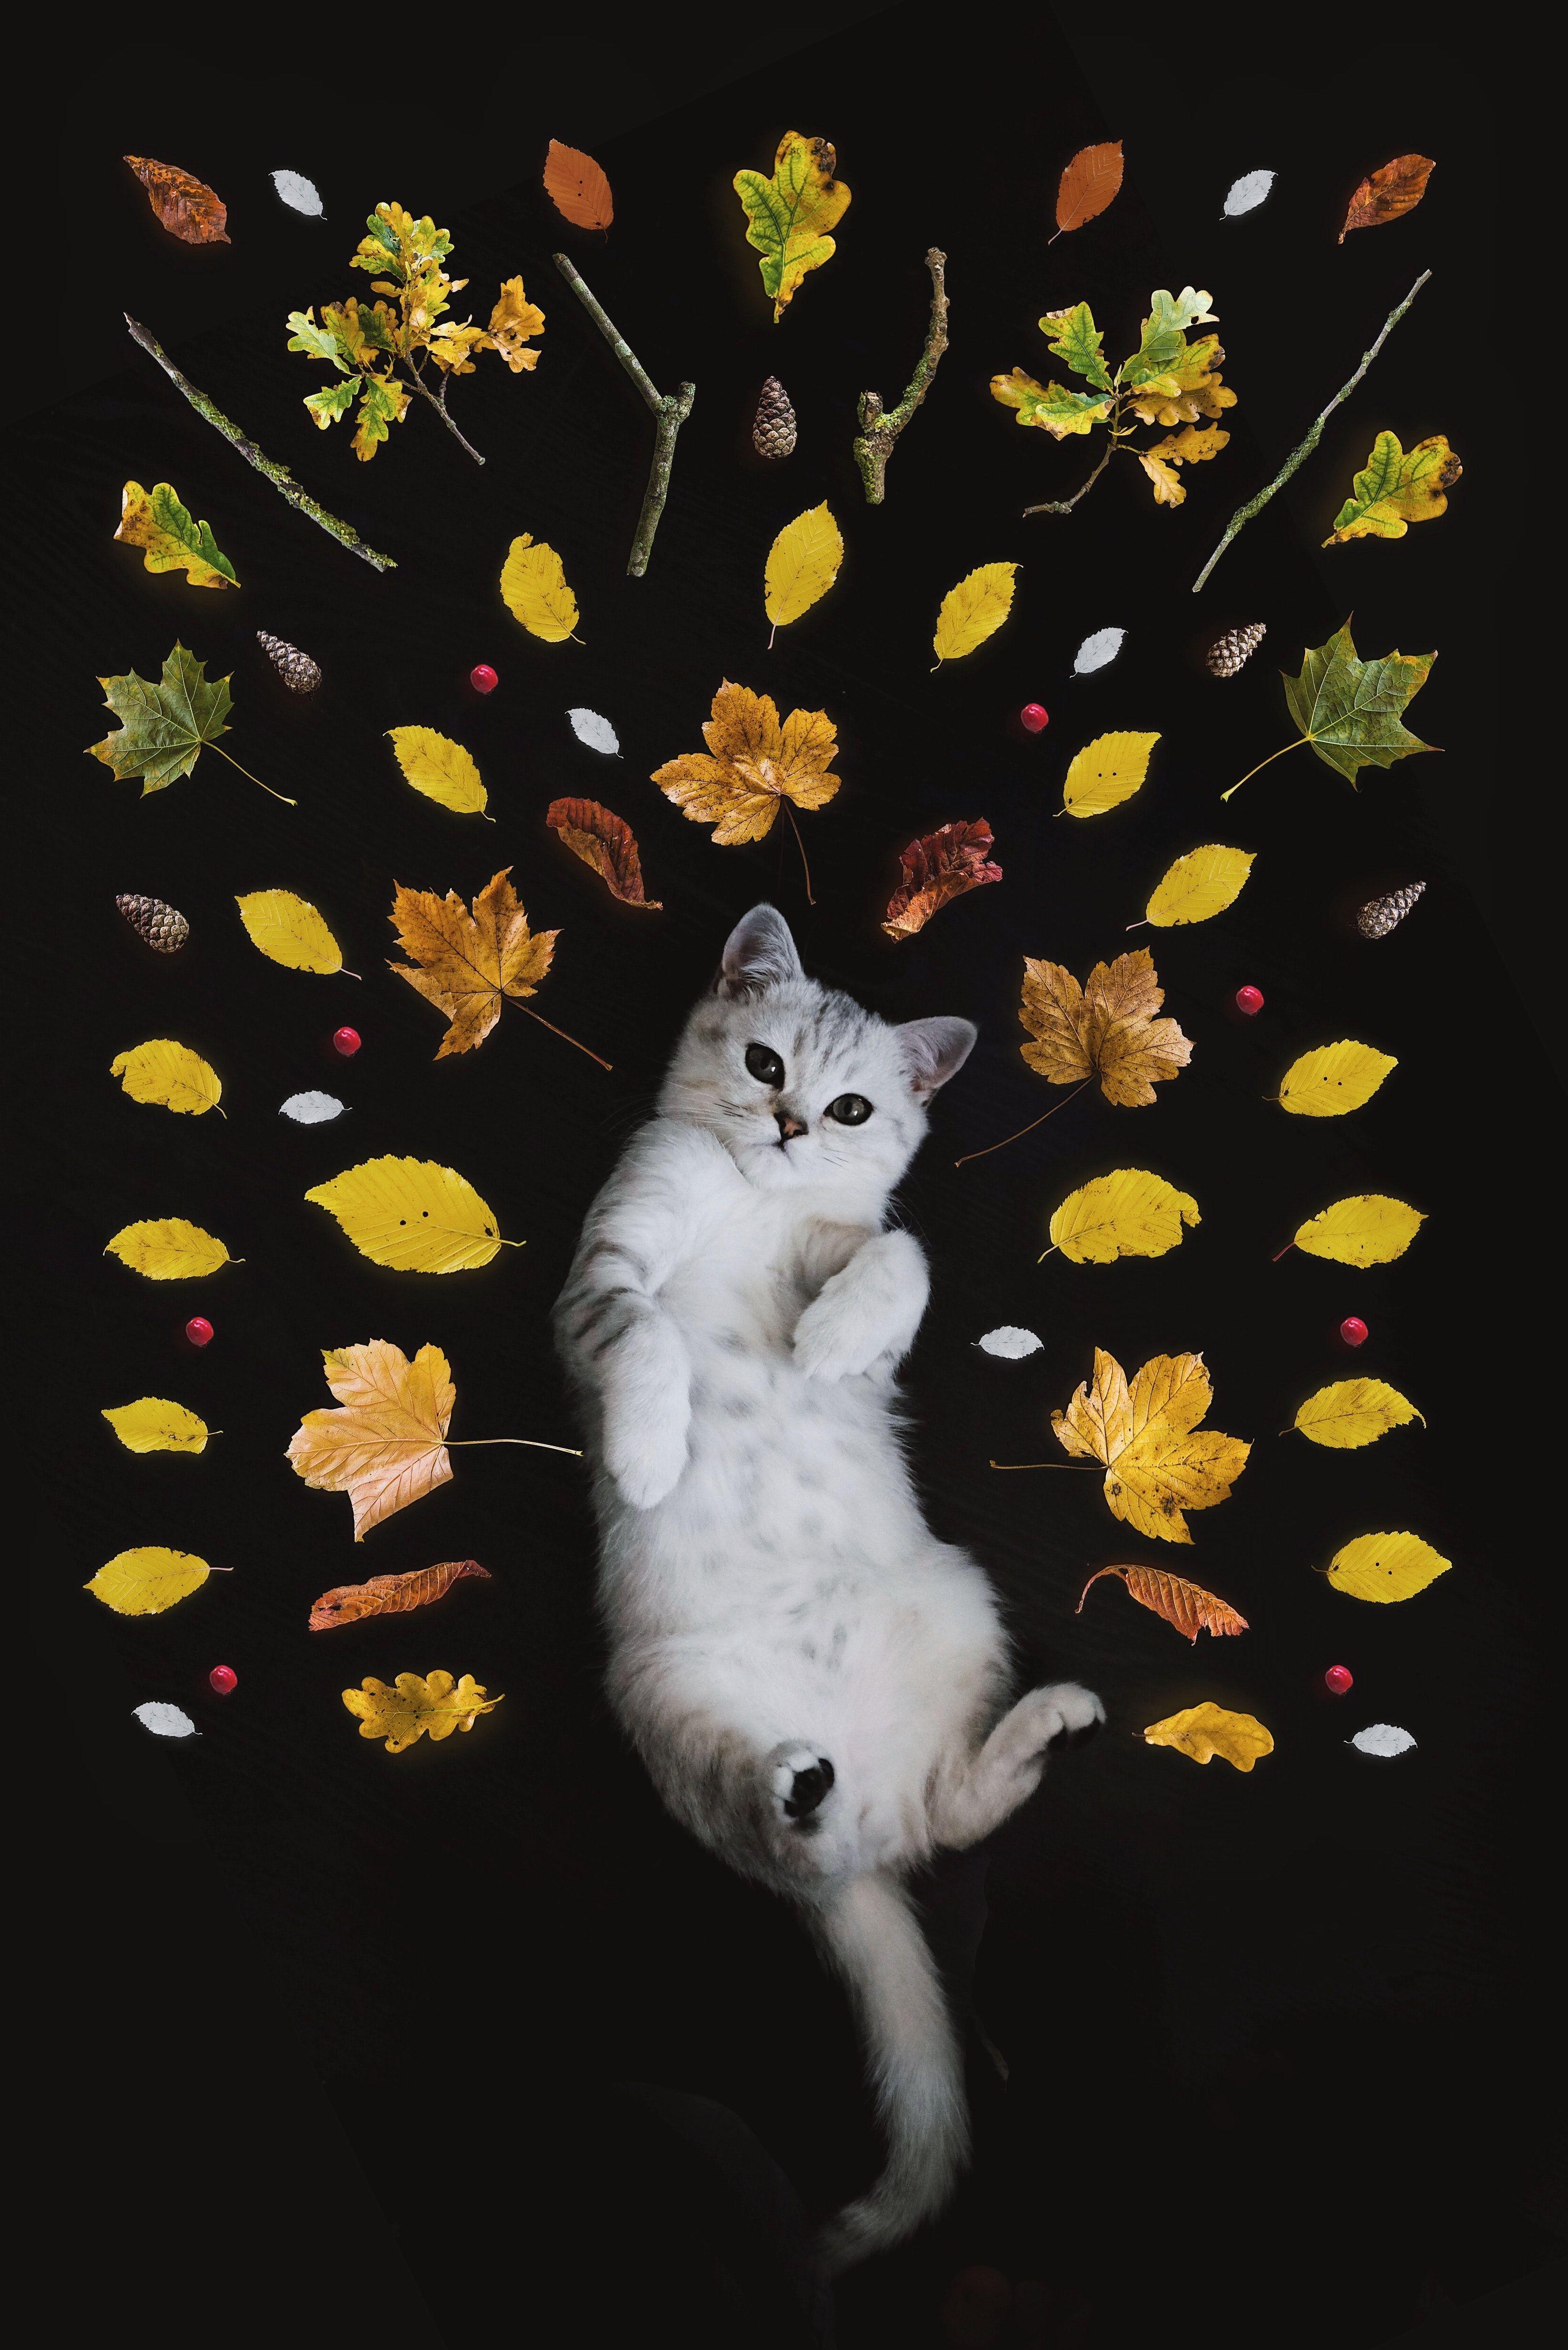 5 Reasons To Talk To Your Cat Silver Tabby Cat Cute Cat Wallpaper Cat Wallpaper